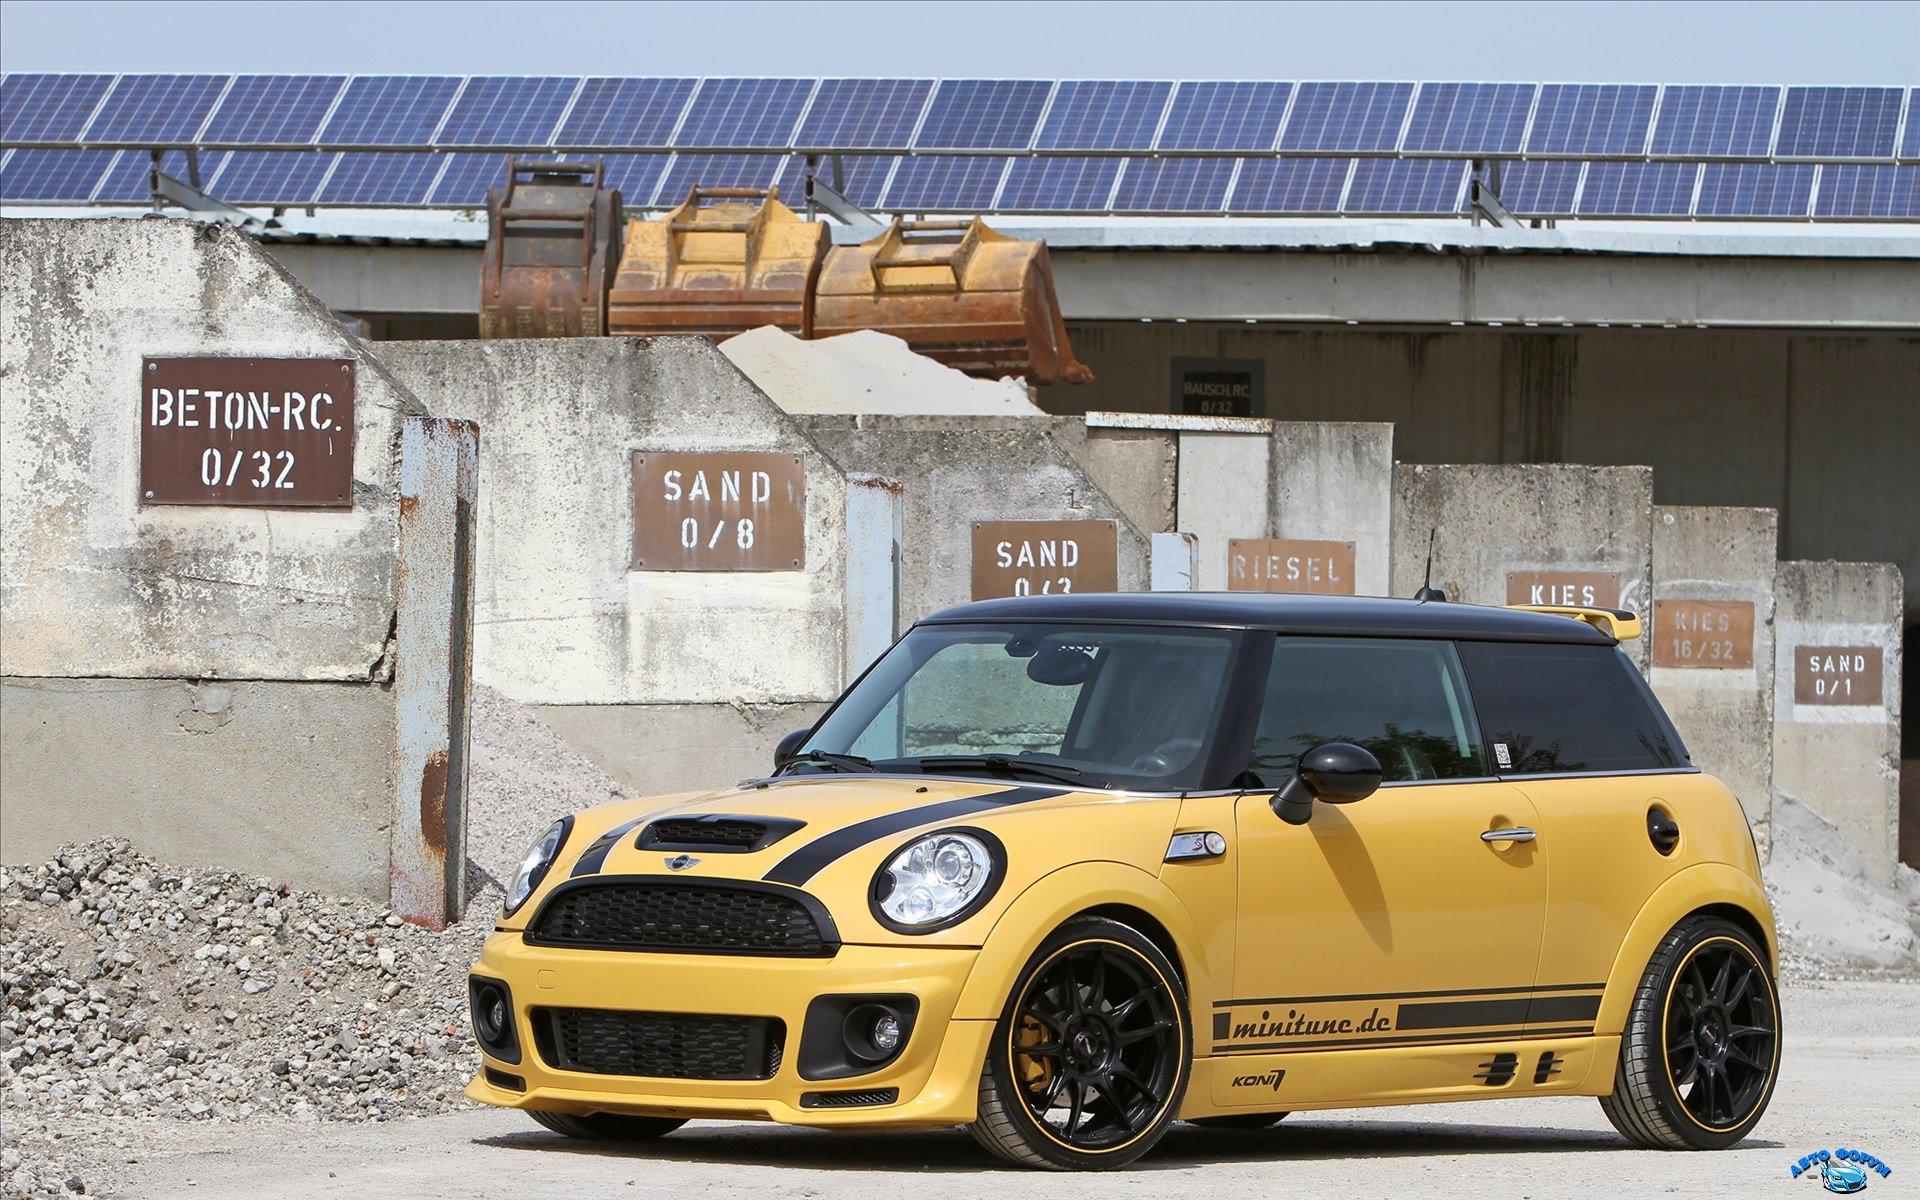 Minitune-MINI-Cooper-S-R56-2014-widescreen-03.jpg